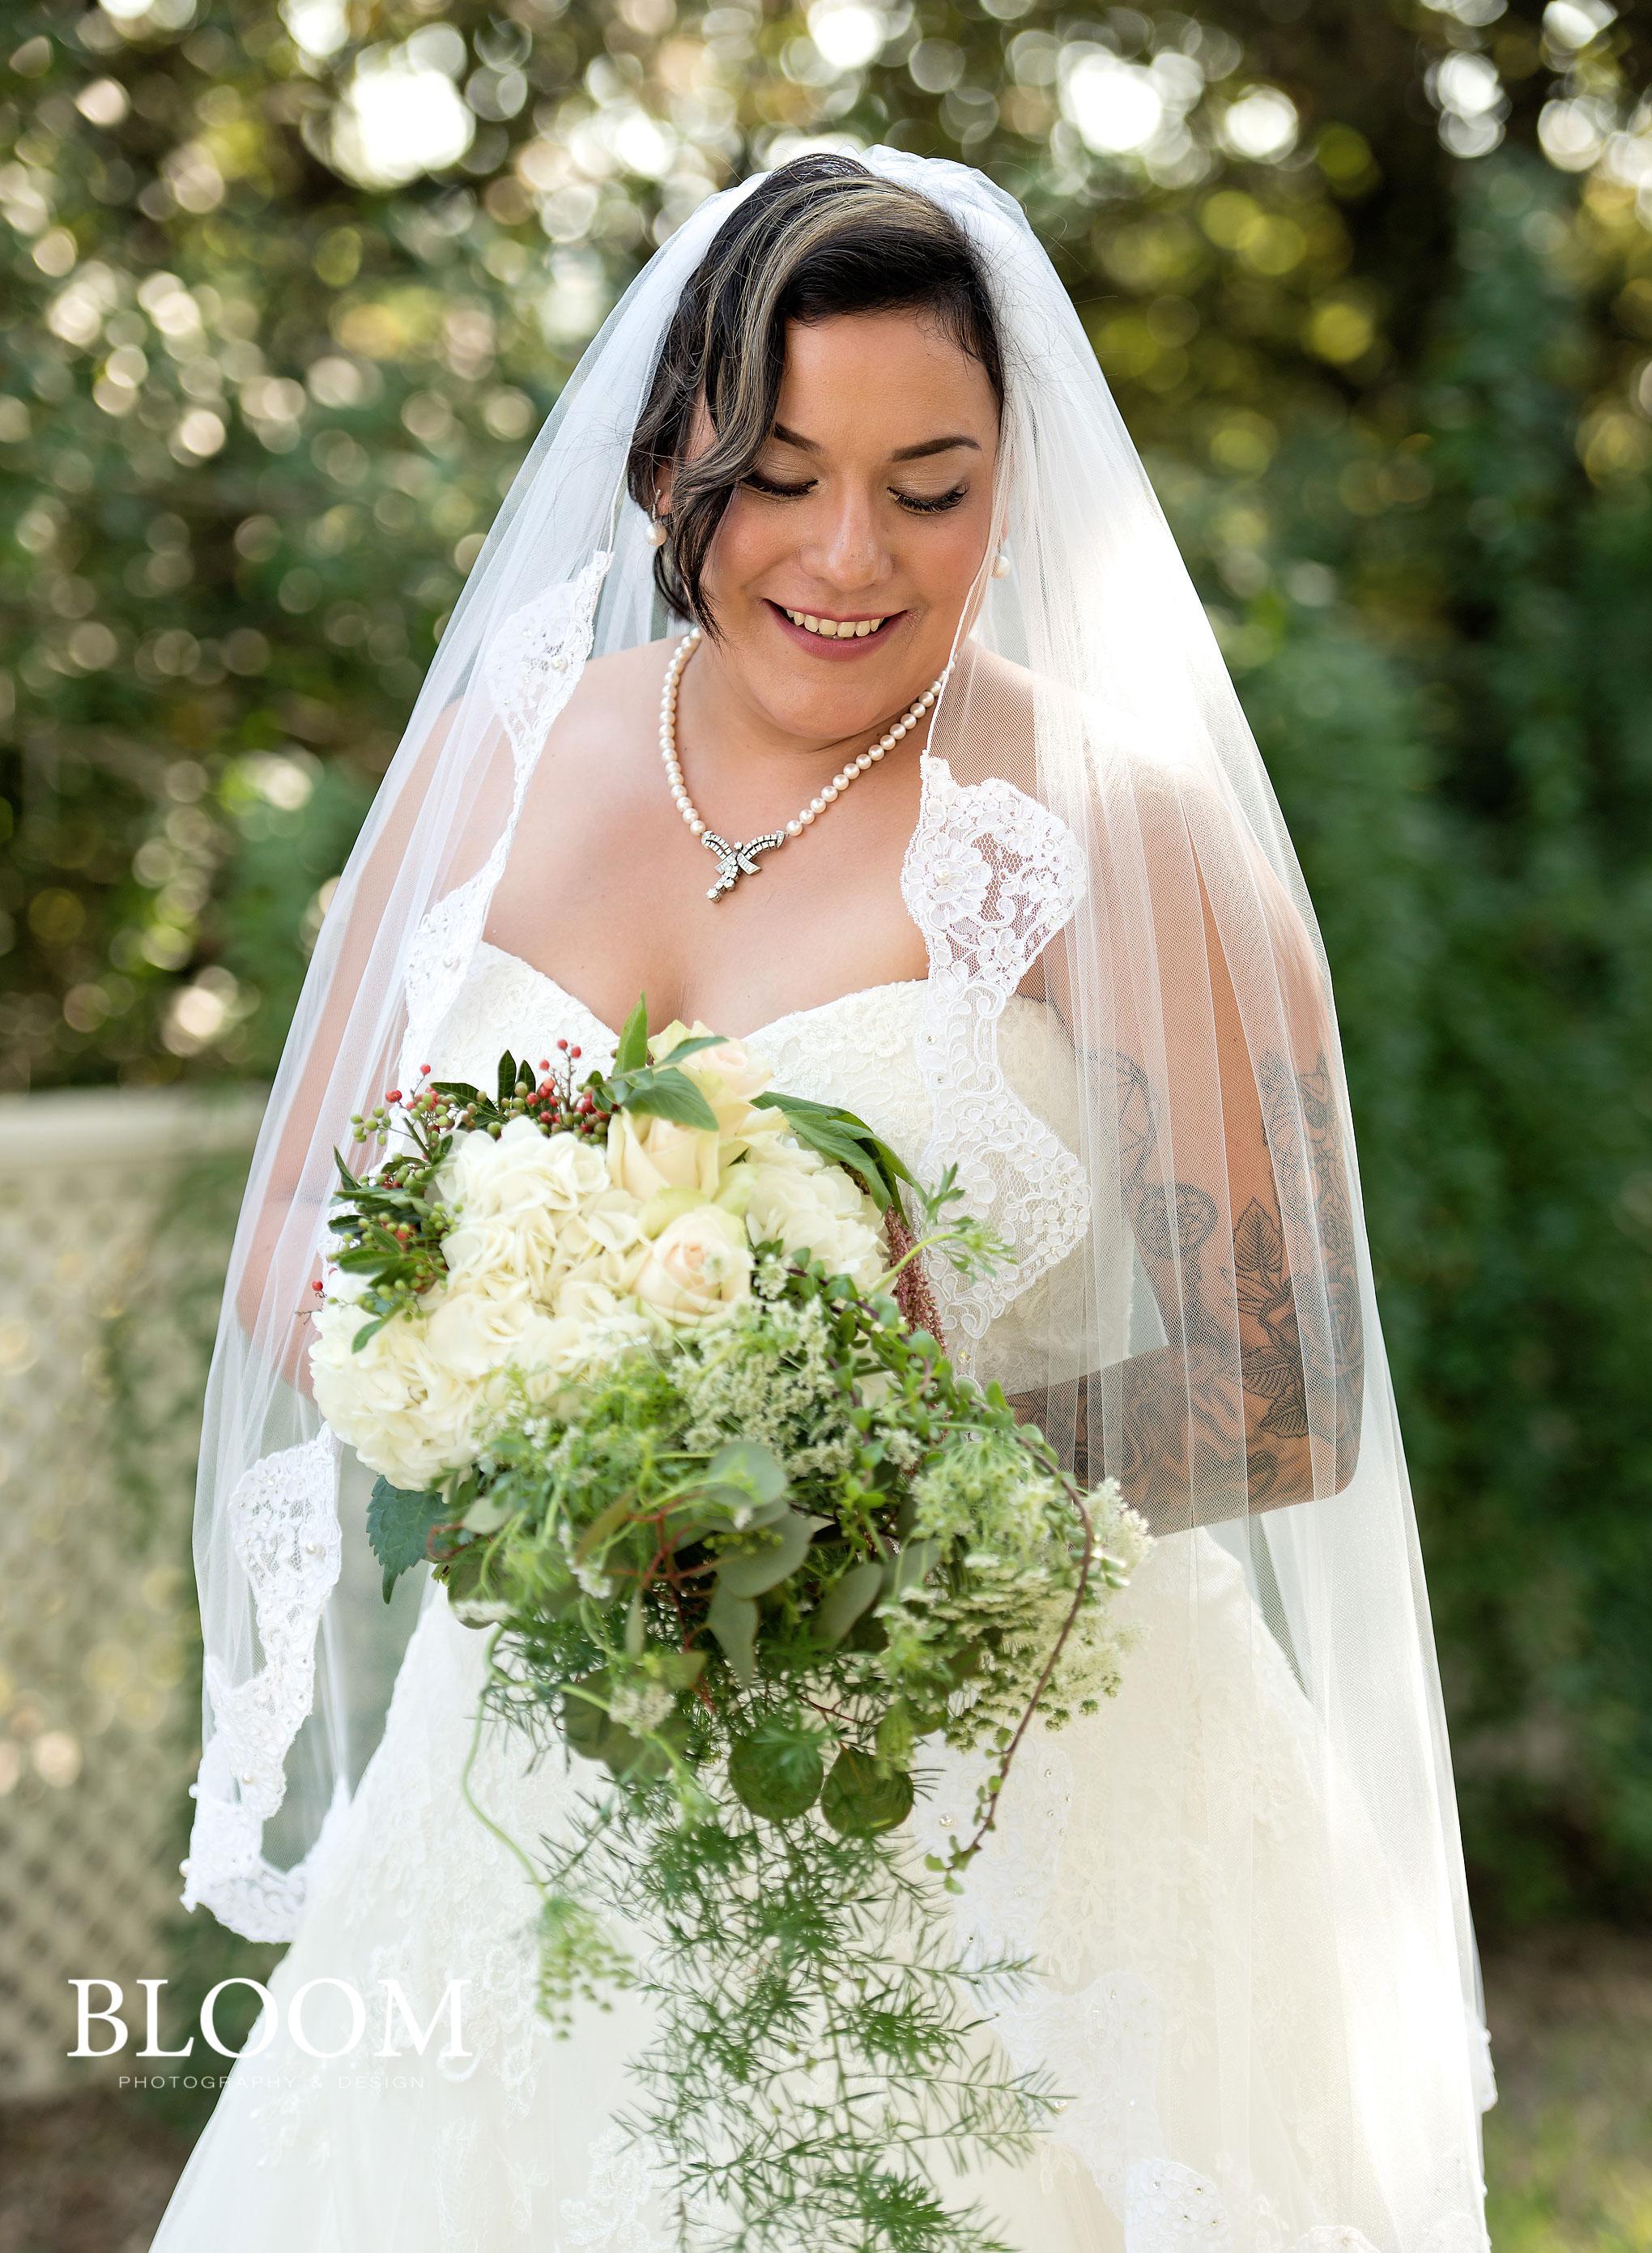 Wedding_photography_san_antonio_texas_bloom_NMM_6011.jpg